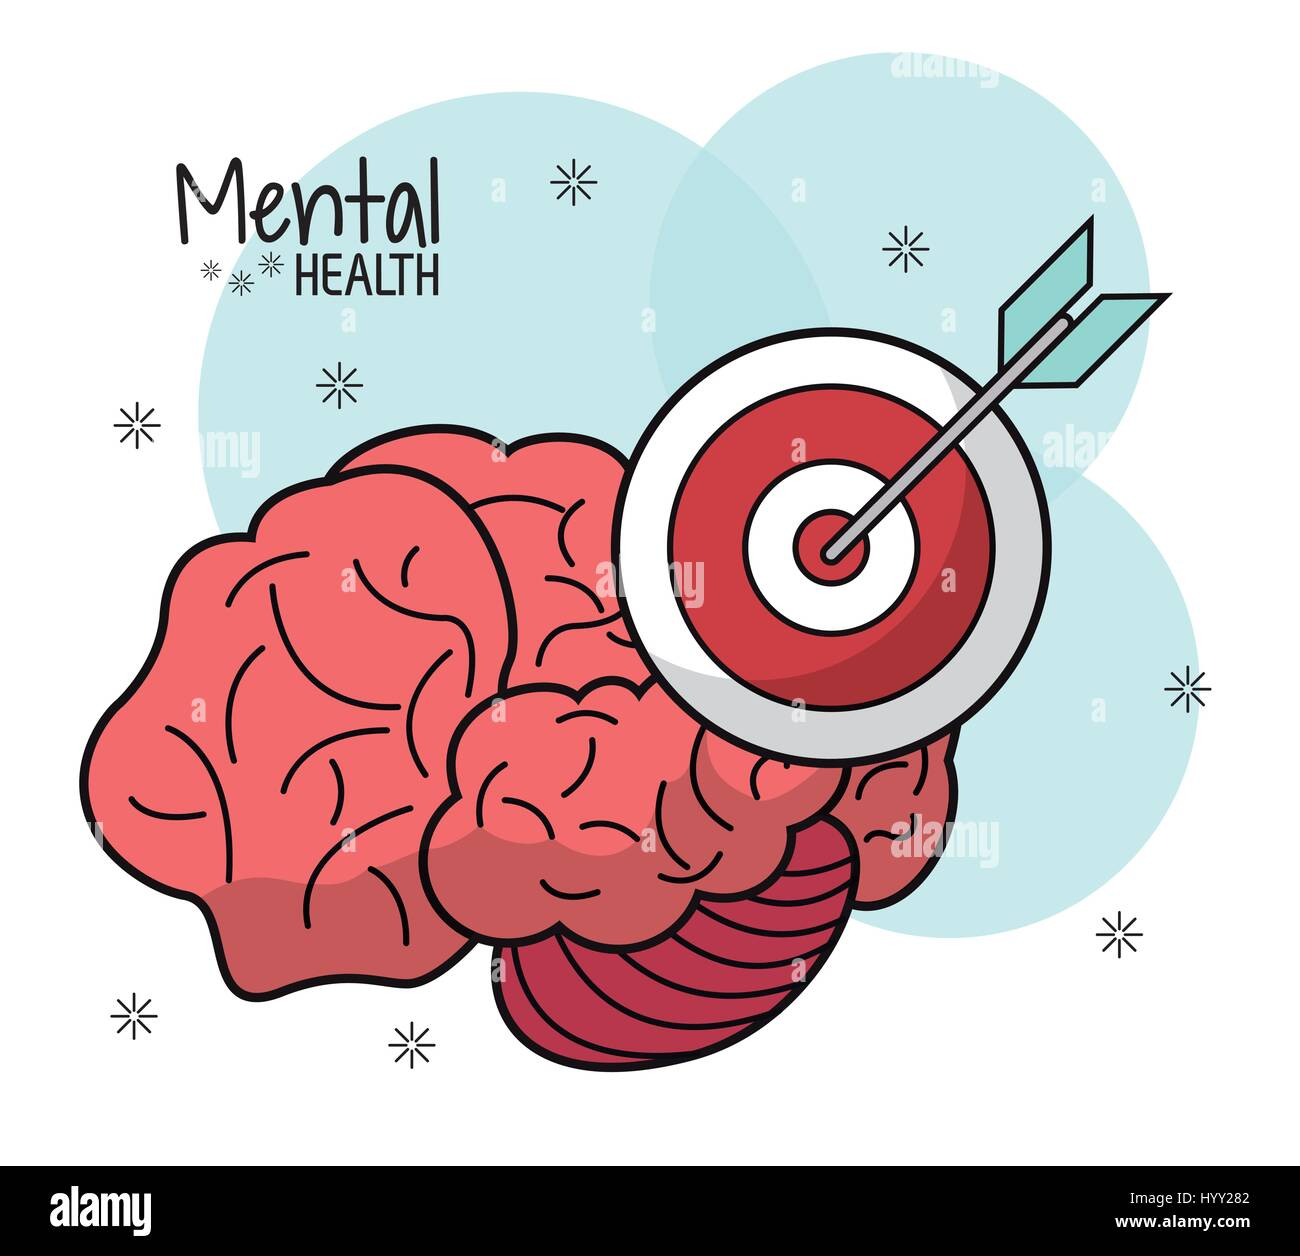 brain mental health target innovation - Stock Image